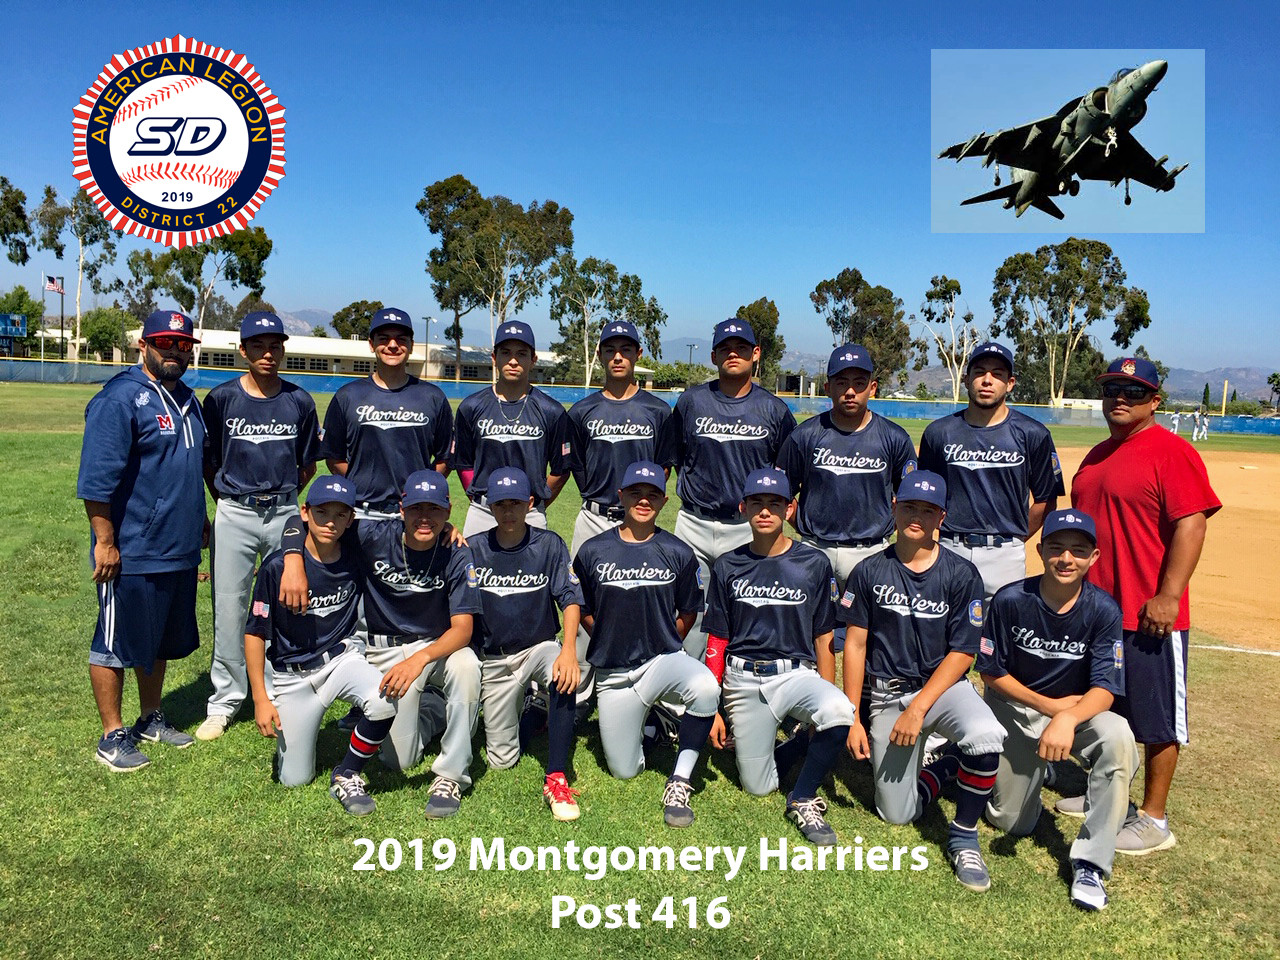 Post 416 Montgomery Harriers